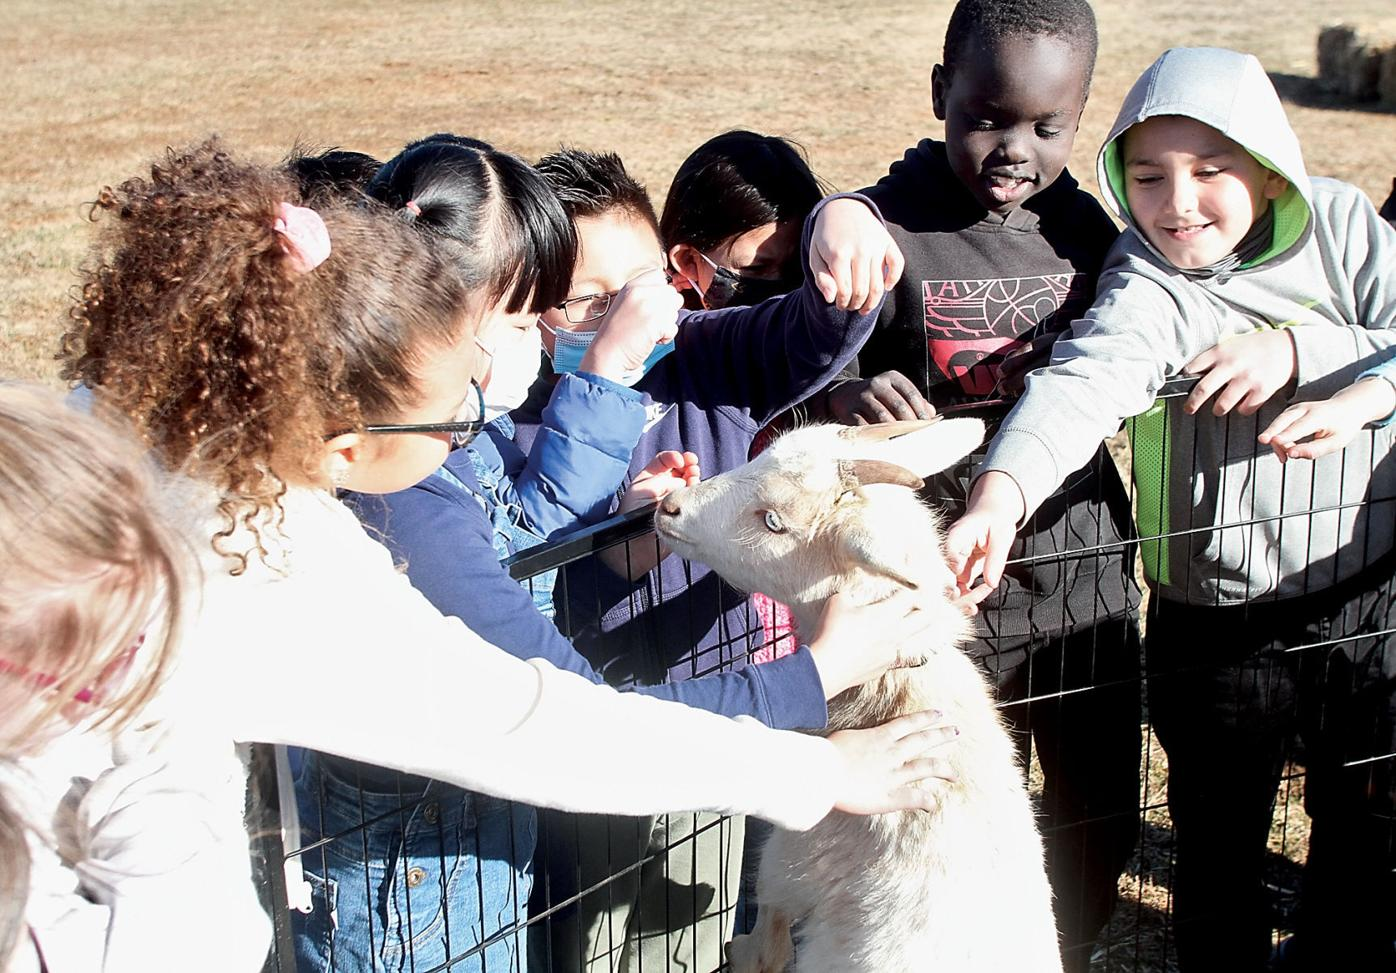 Foothills Elementary School students pet goat